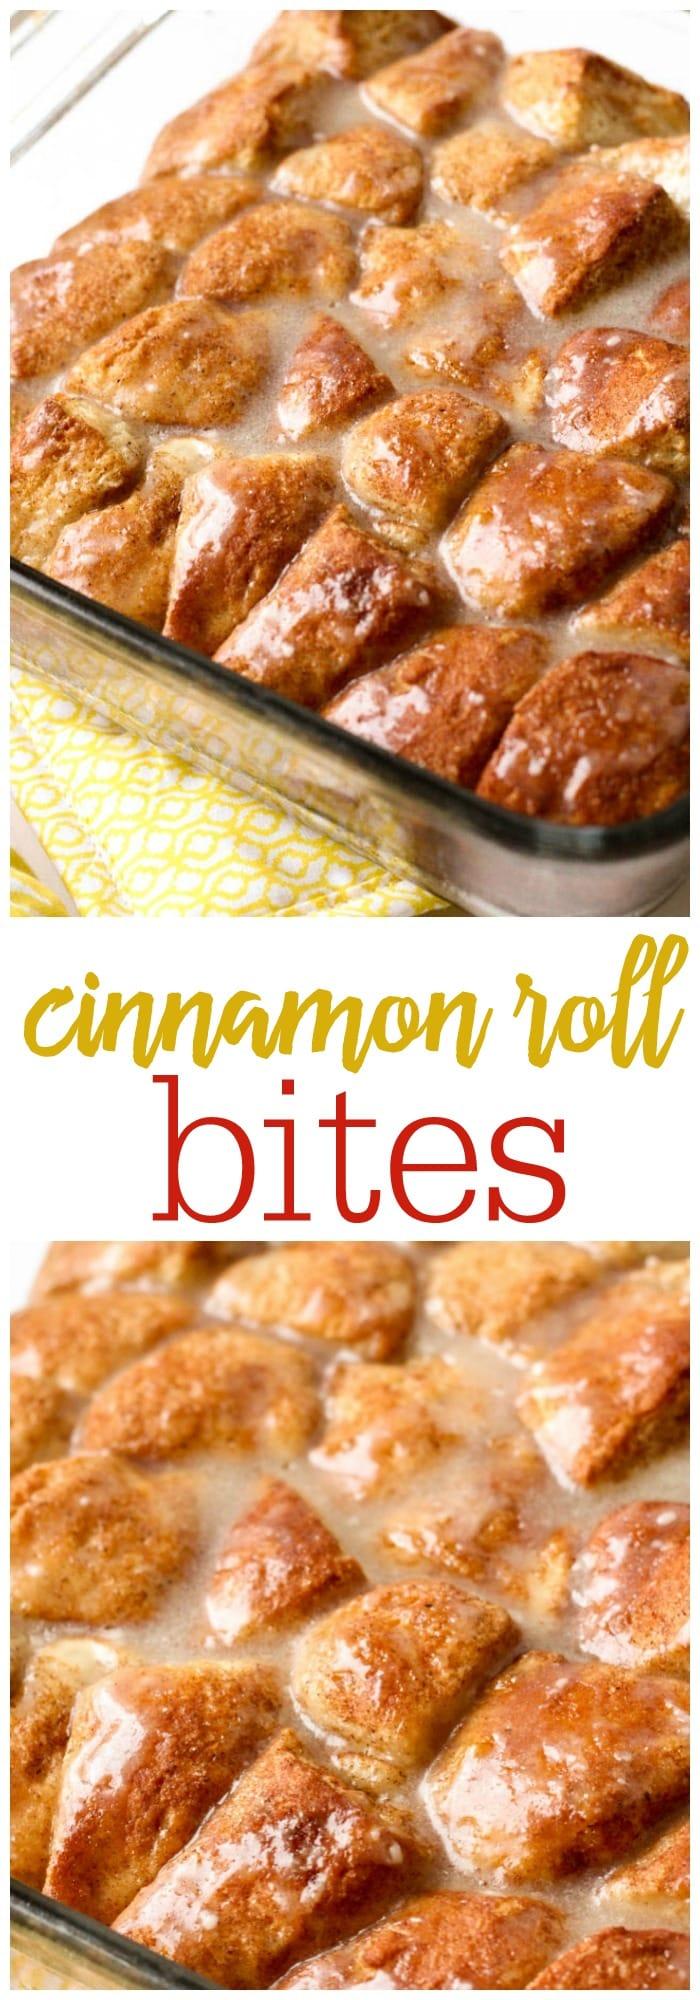 Super simple and delicious Cinnamon Roll Bites - so good { lilluna.com } Recipe includes refrigerated biscuits, butter, cinnamon, & sugar with a yummy glaze!